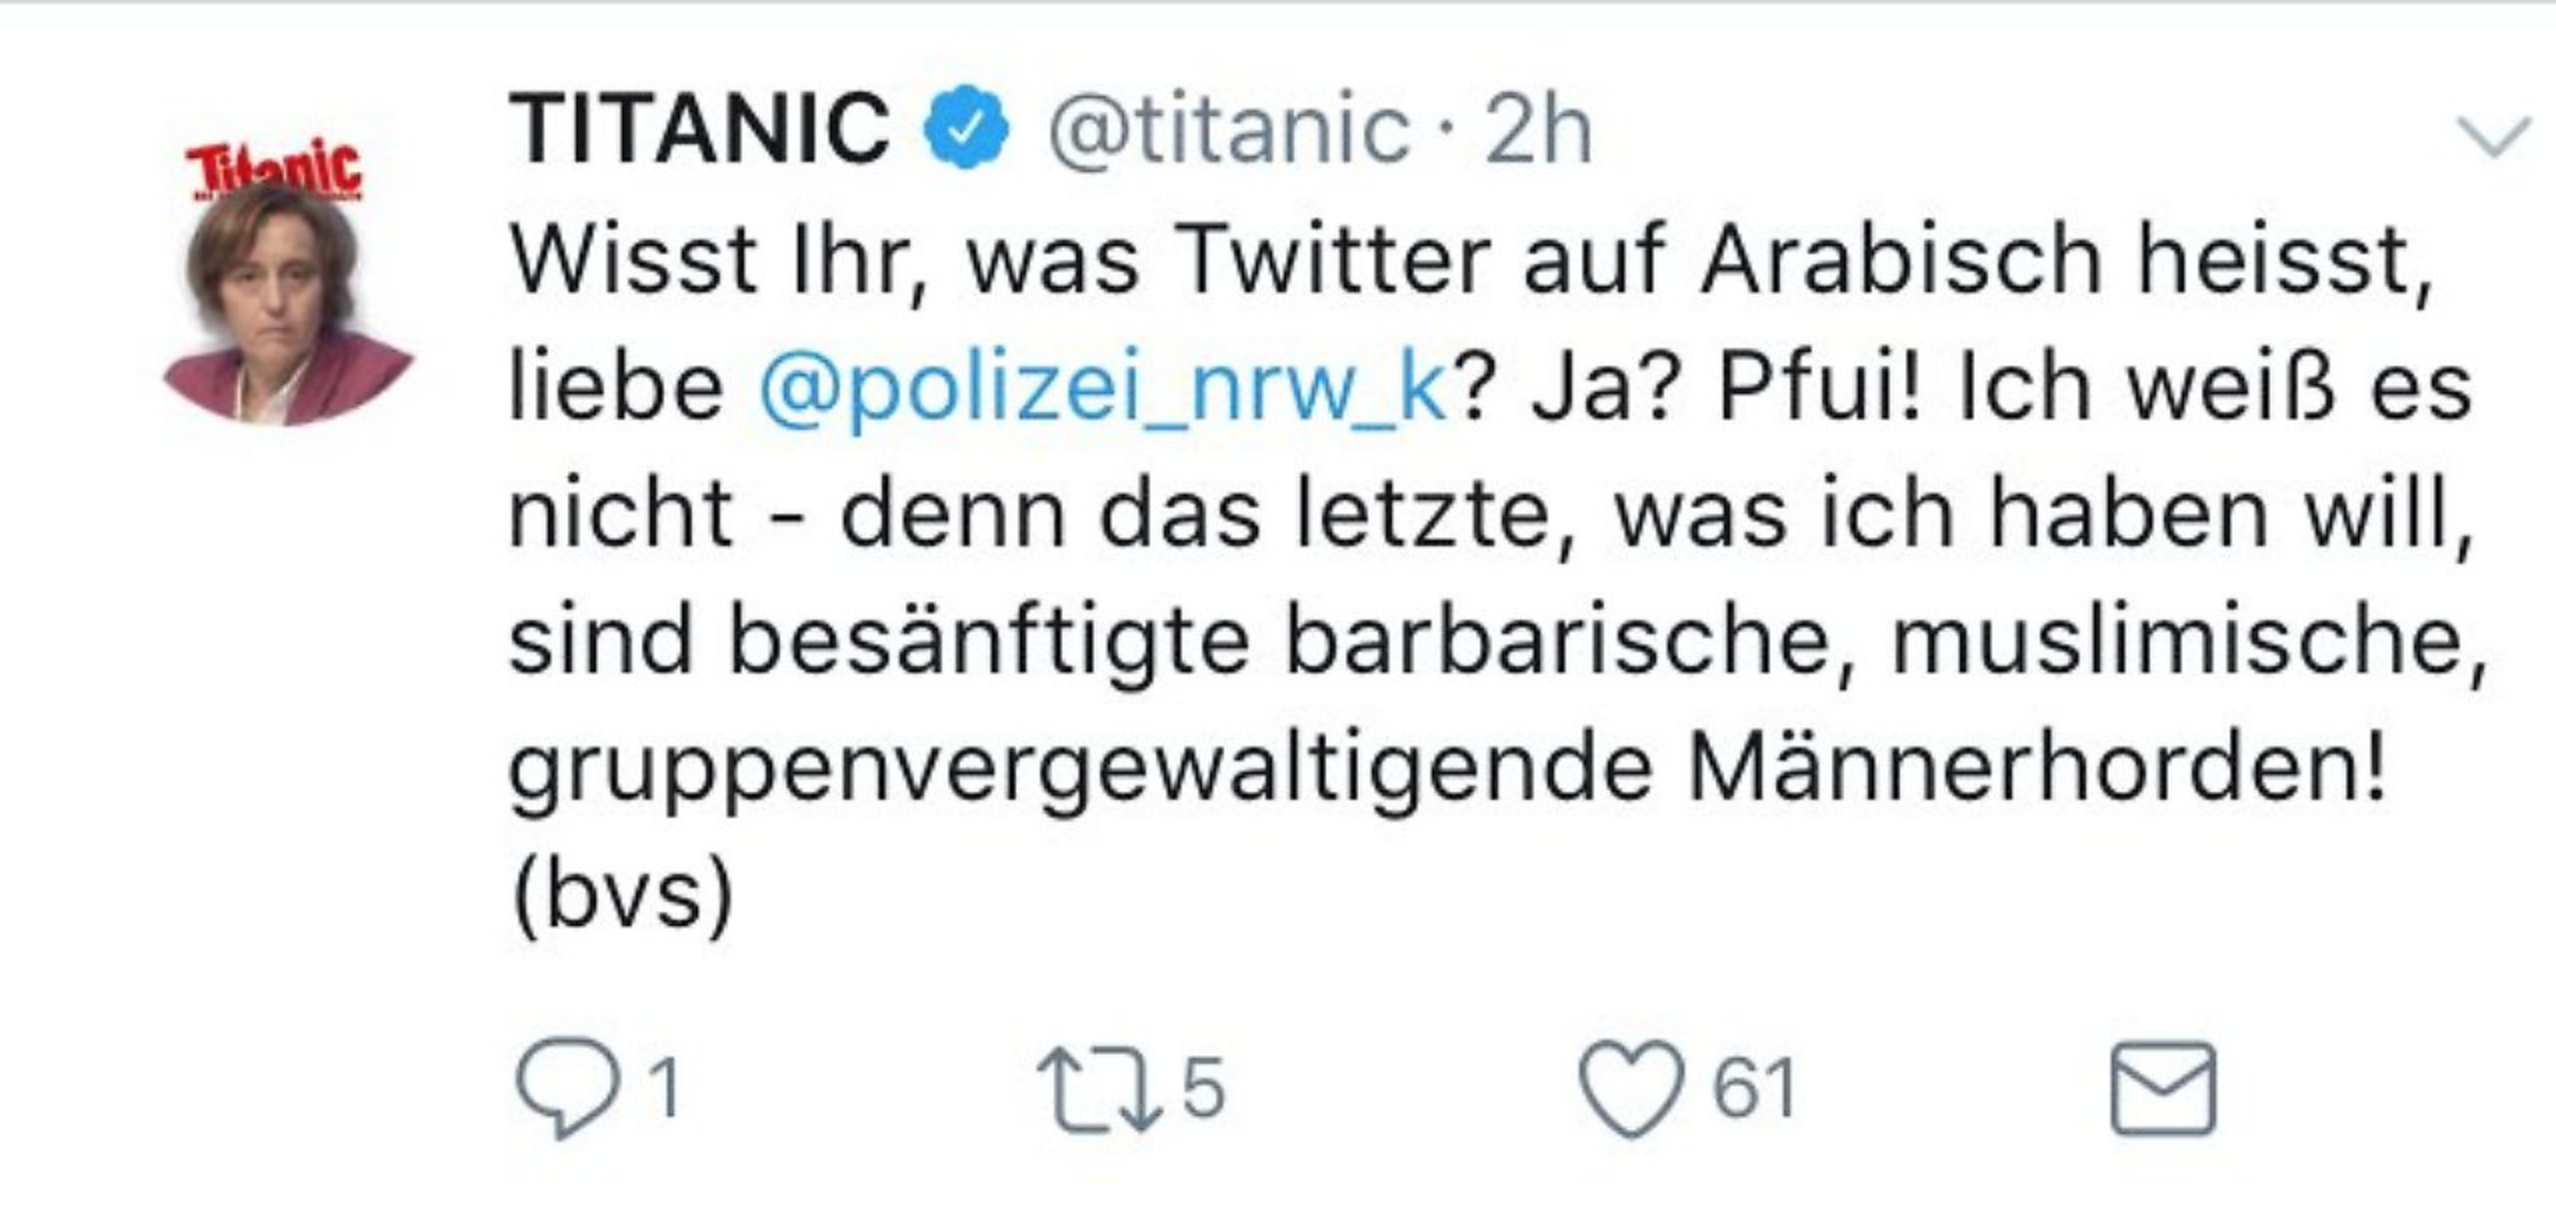 Titanic Tweet